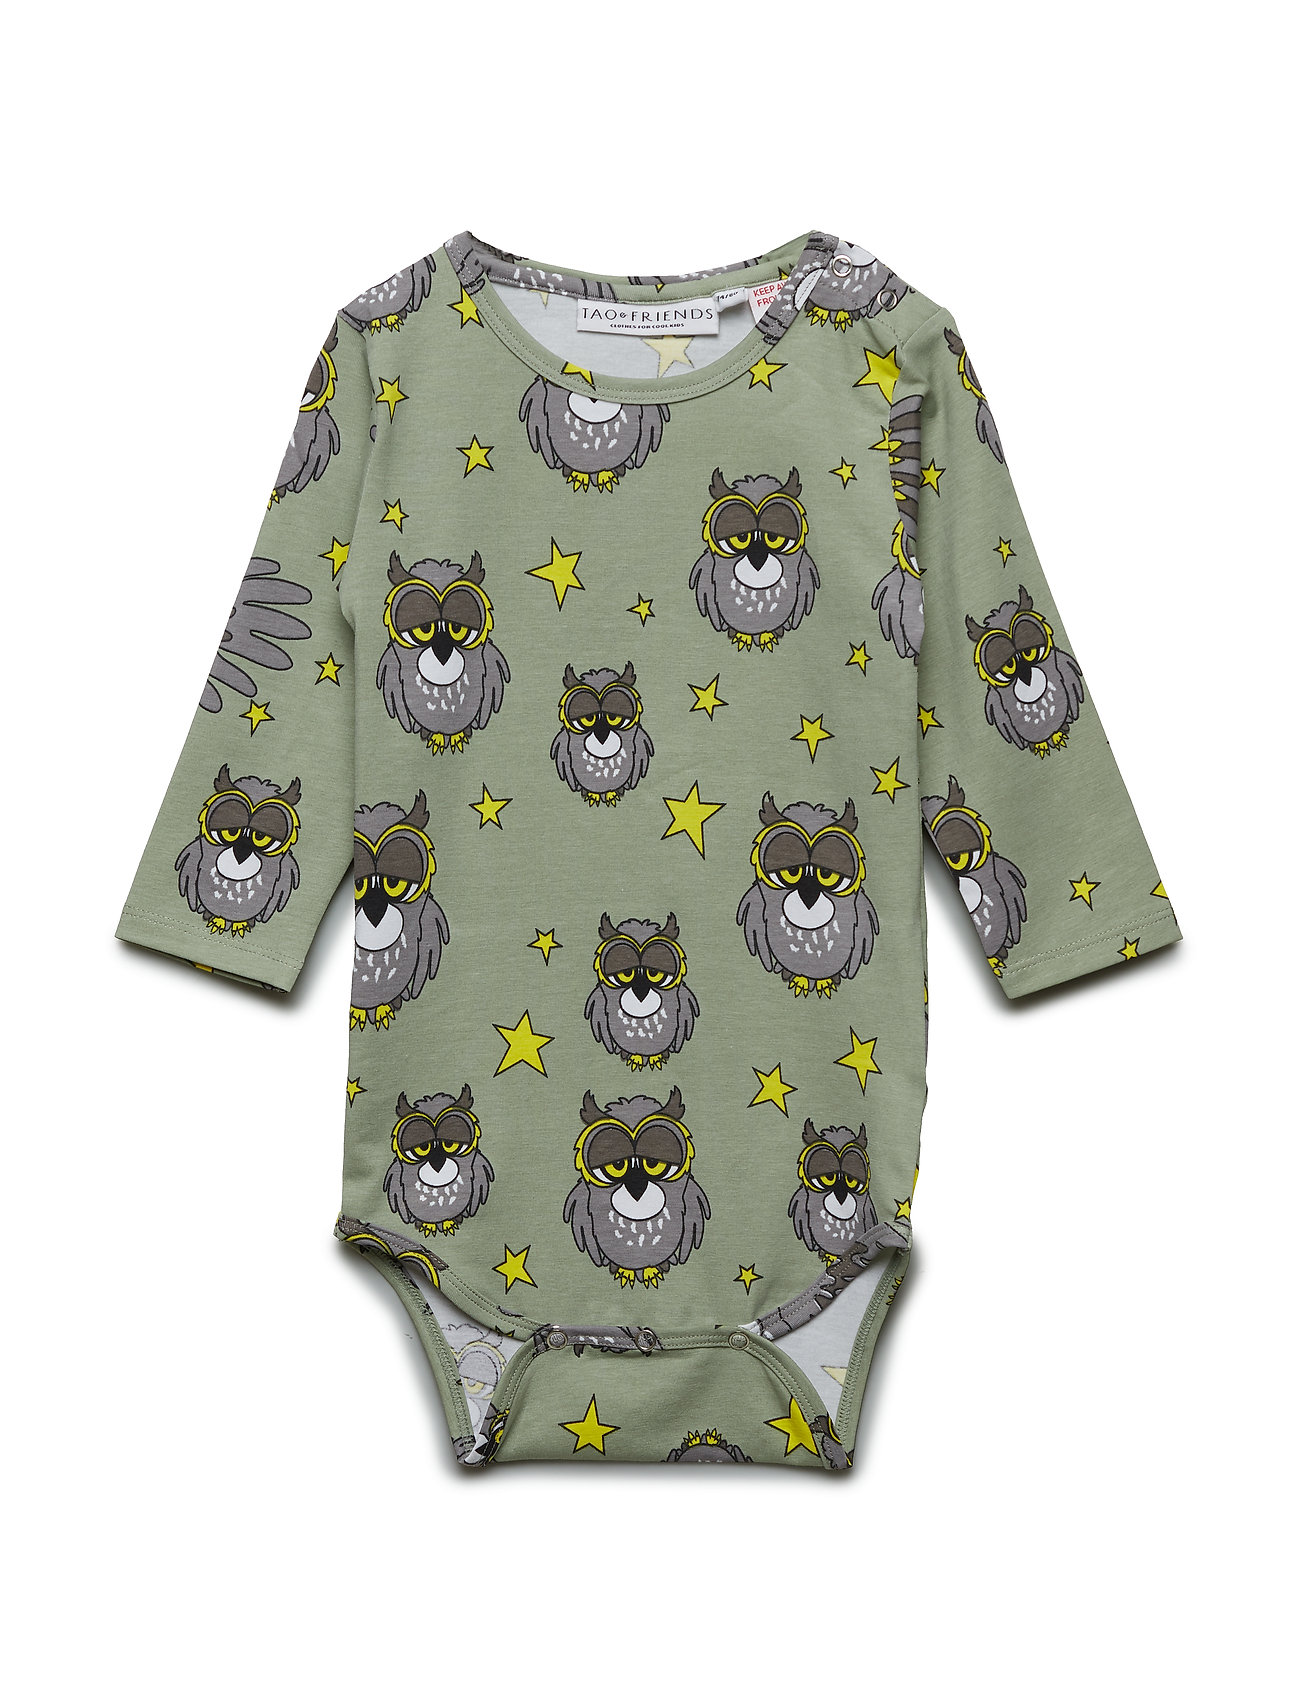 Tao & friends Wrap Baby Body multi-animal UGGLAN - LIGHT GREEN